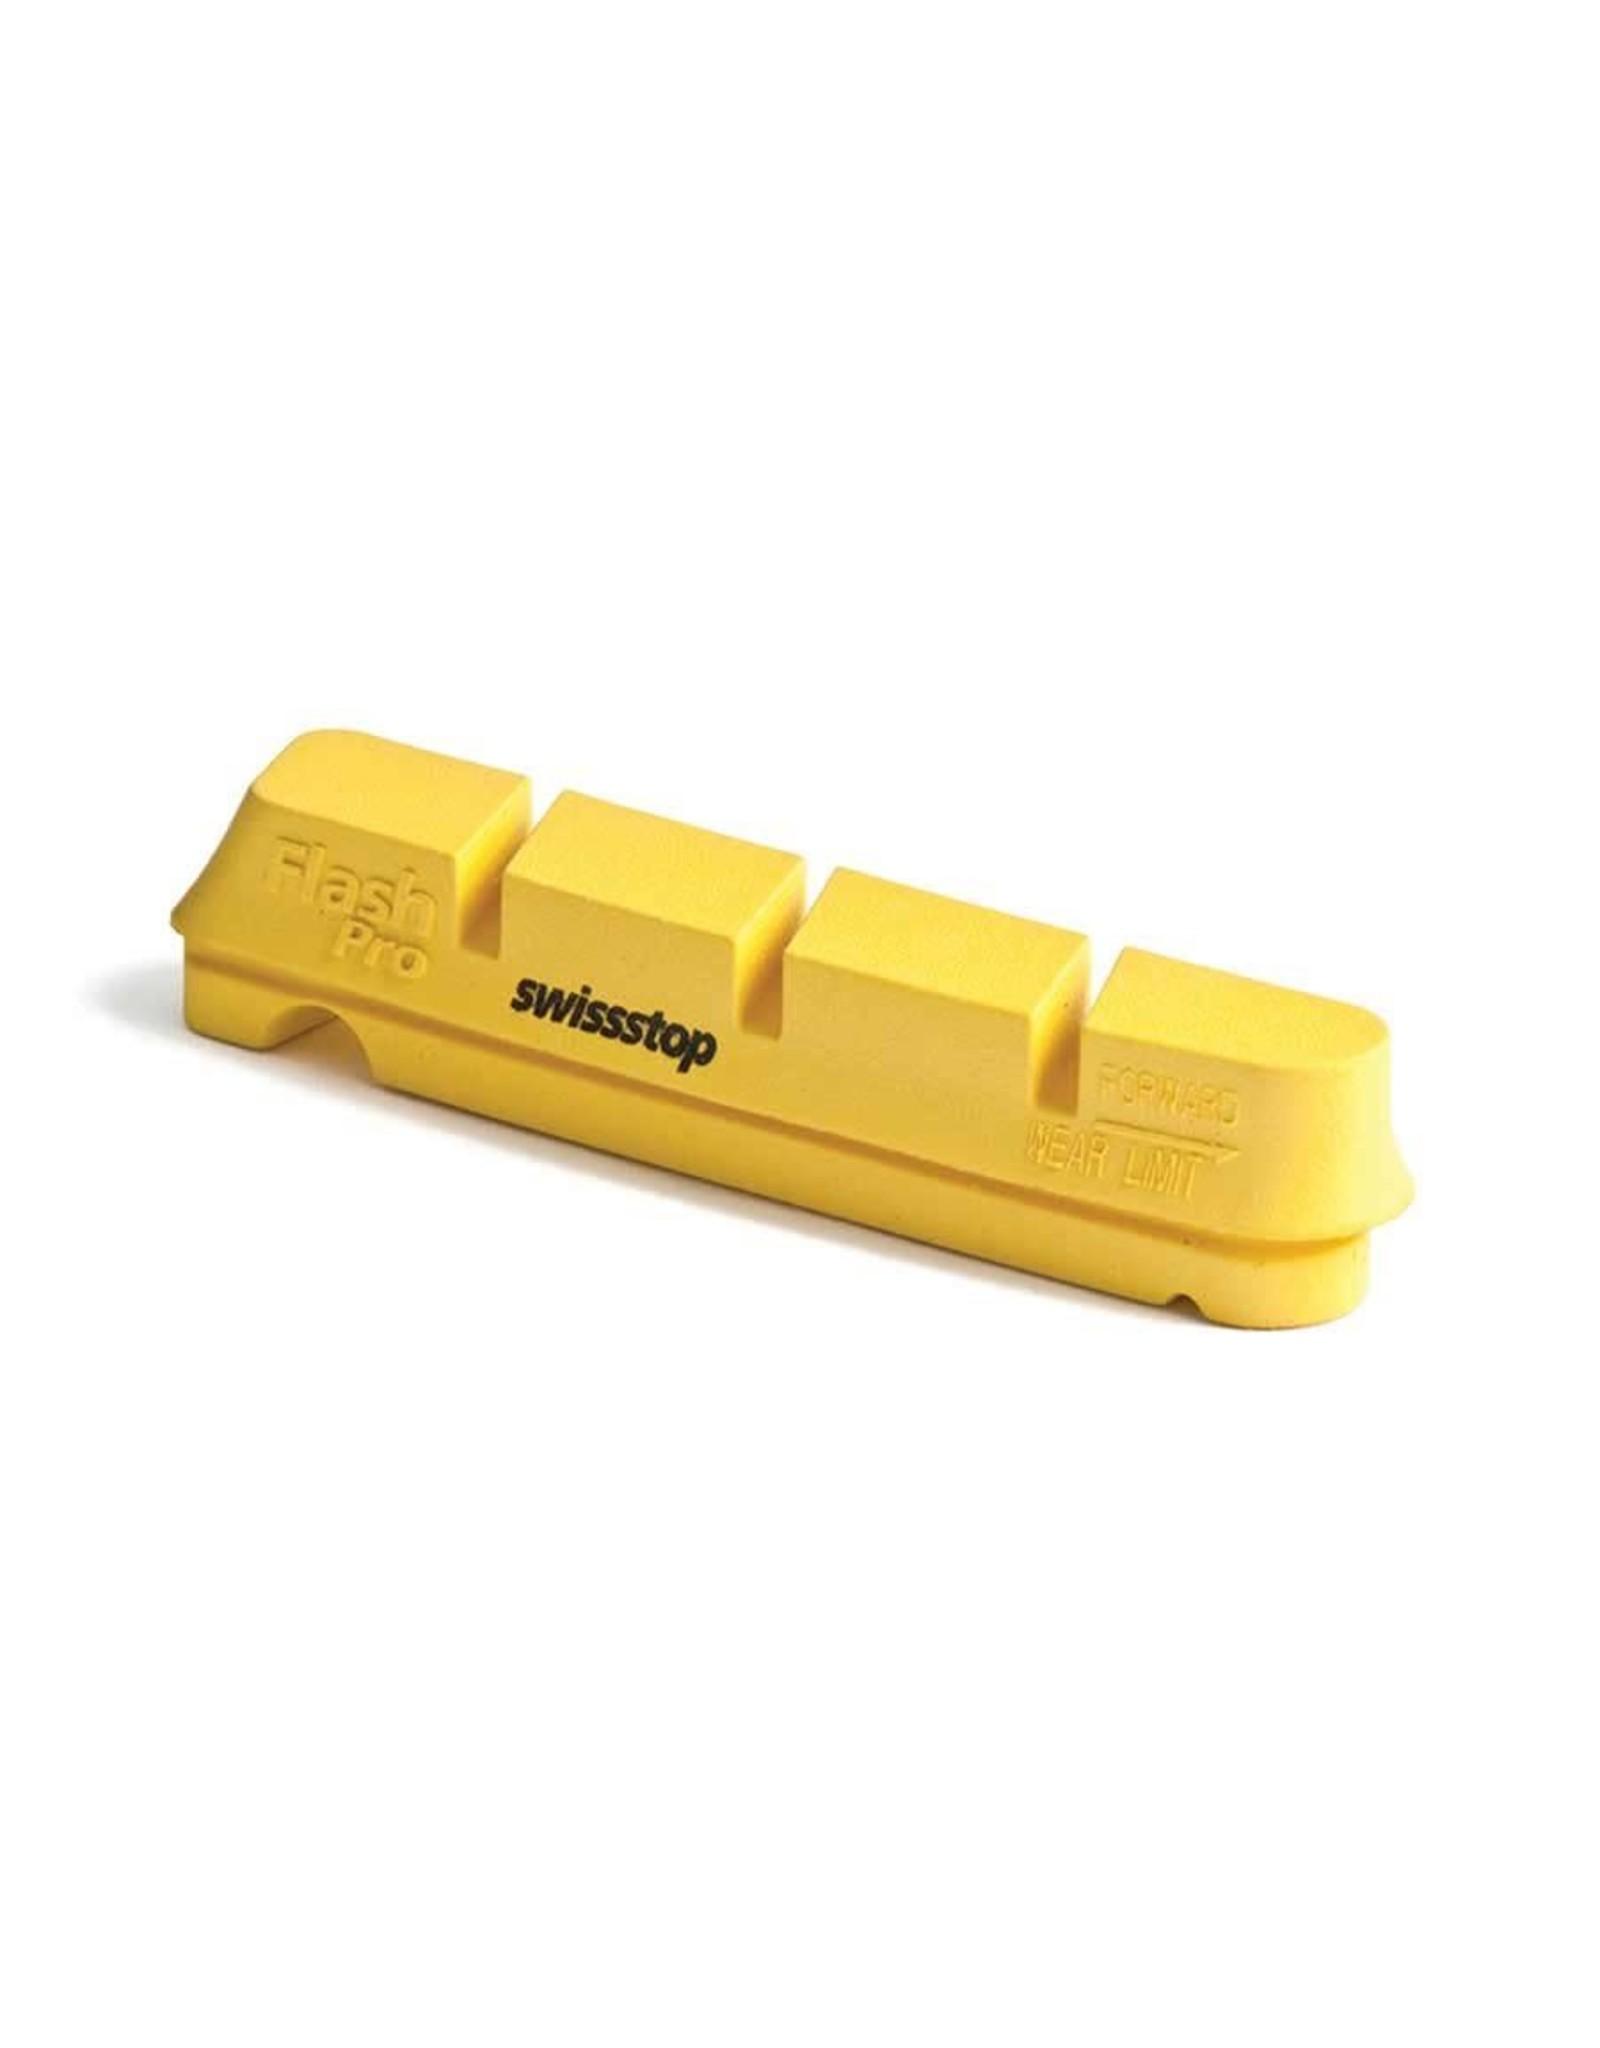 SwissStop SWISSSTOP, Yellow King flash Pro, Campagnolo carbon rims